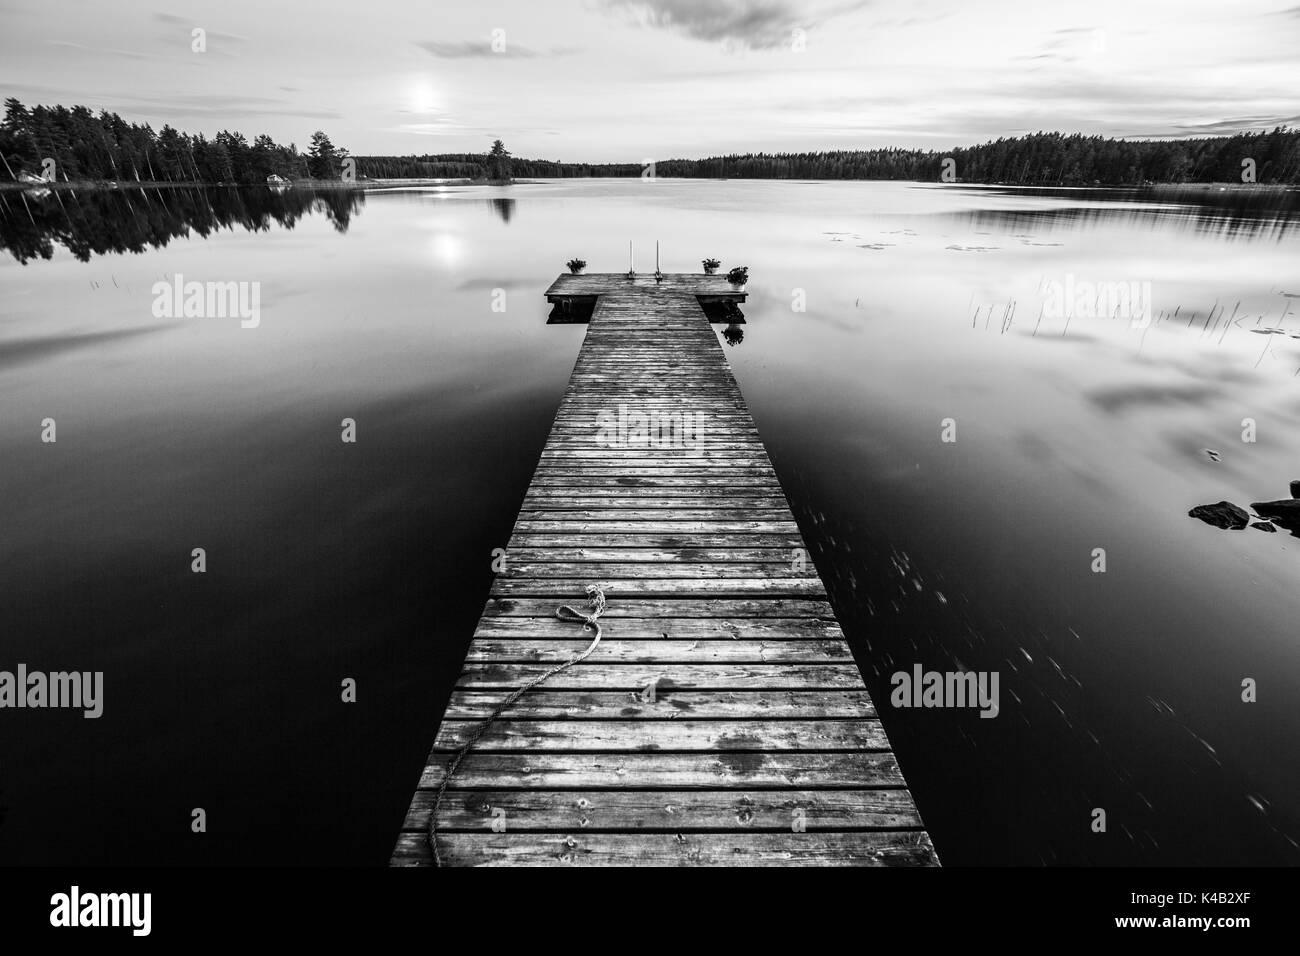 Longlanding Stage At Night In Scandinavia - Stock Image